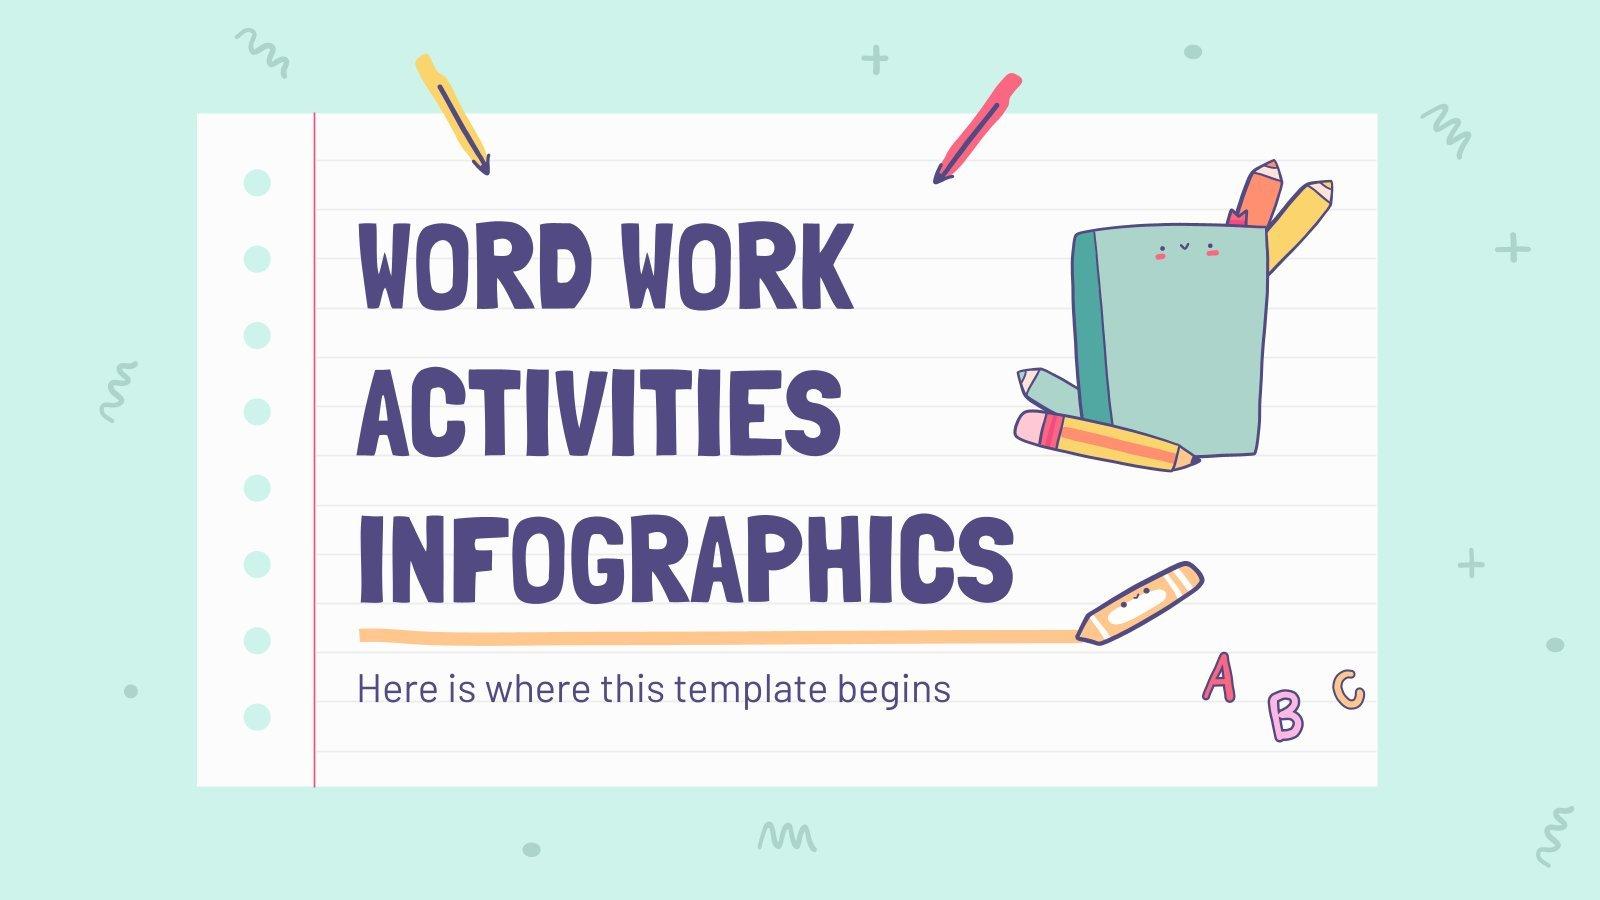 Plantilla de presentación Infografías de actividades de vocabulario